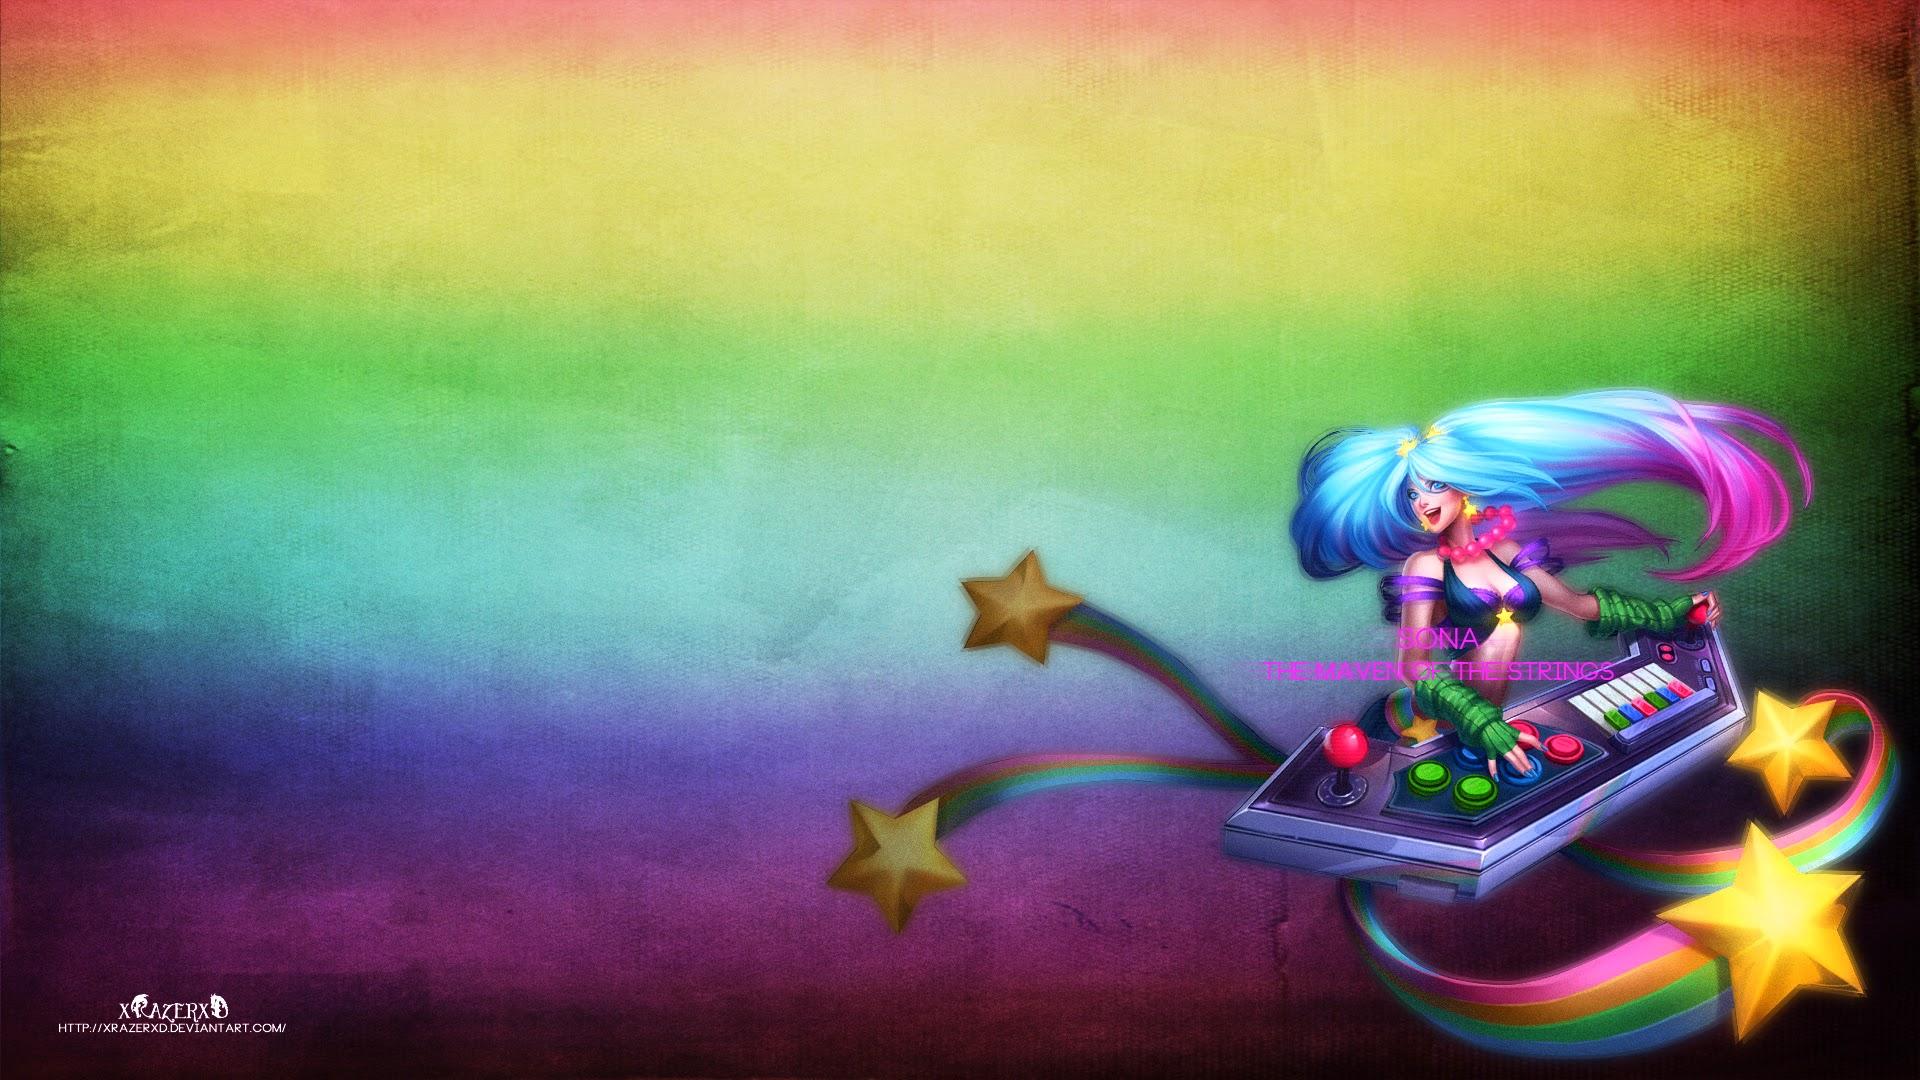 Free Download Arcade Sona League Of Legends Hd Wallpaper Lol Girl